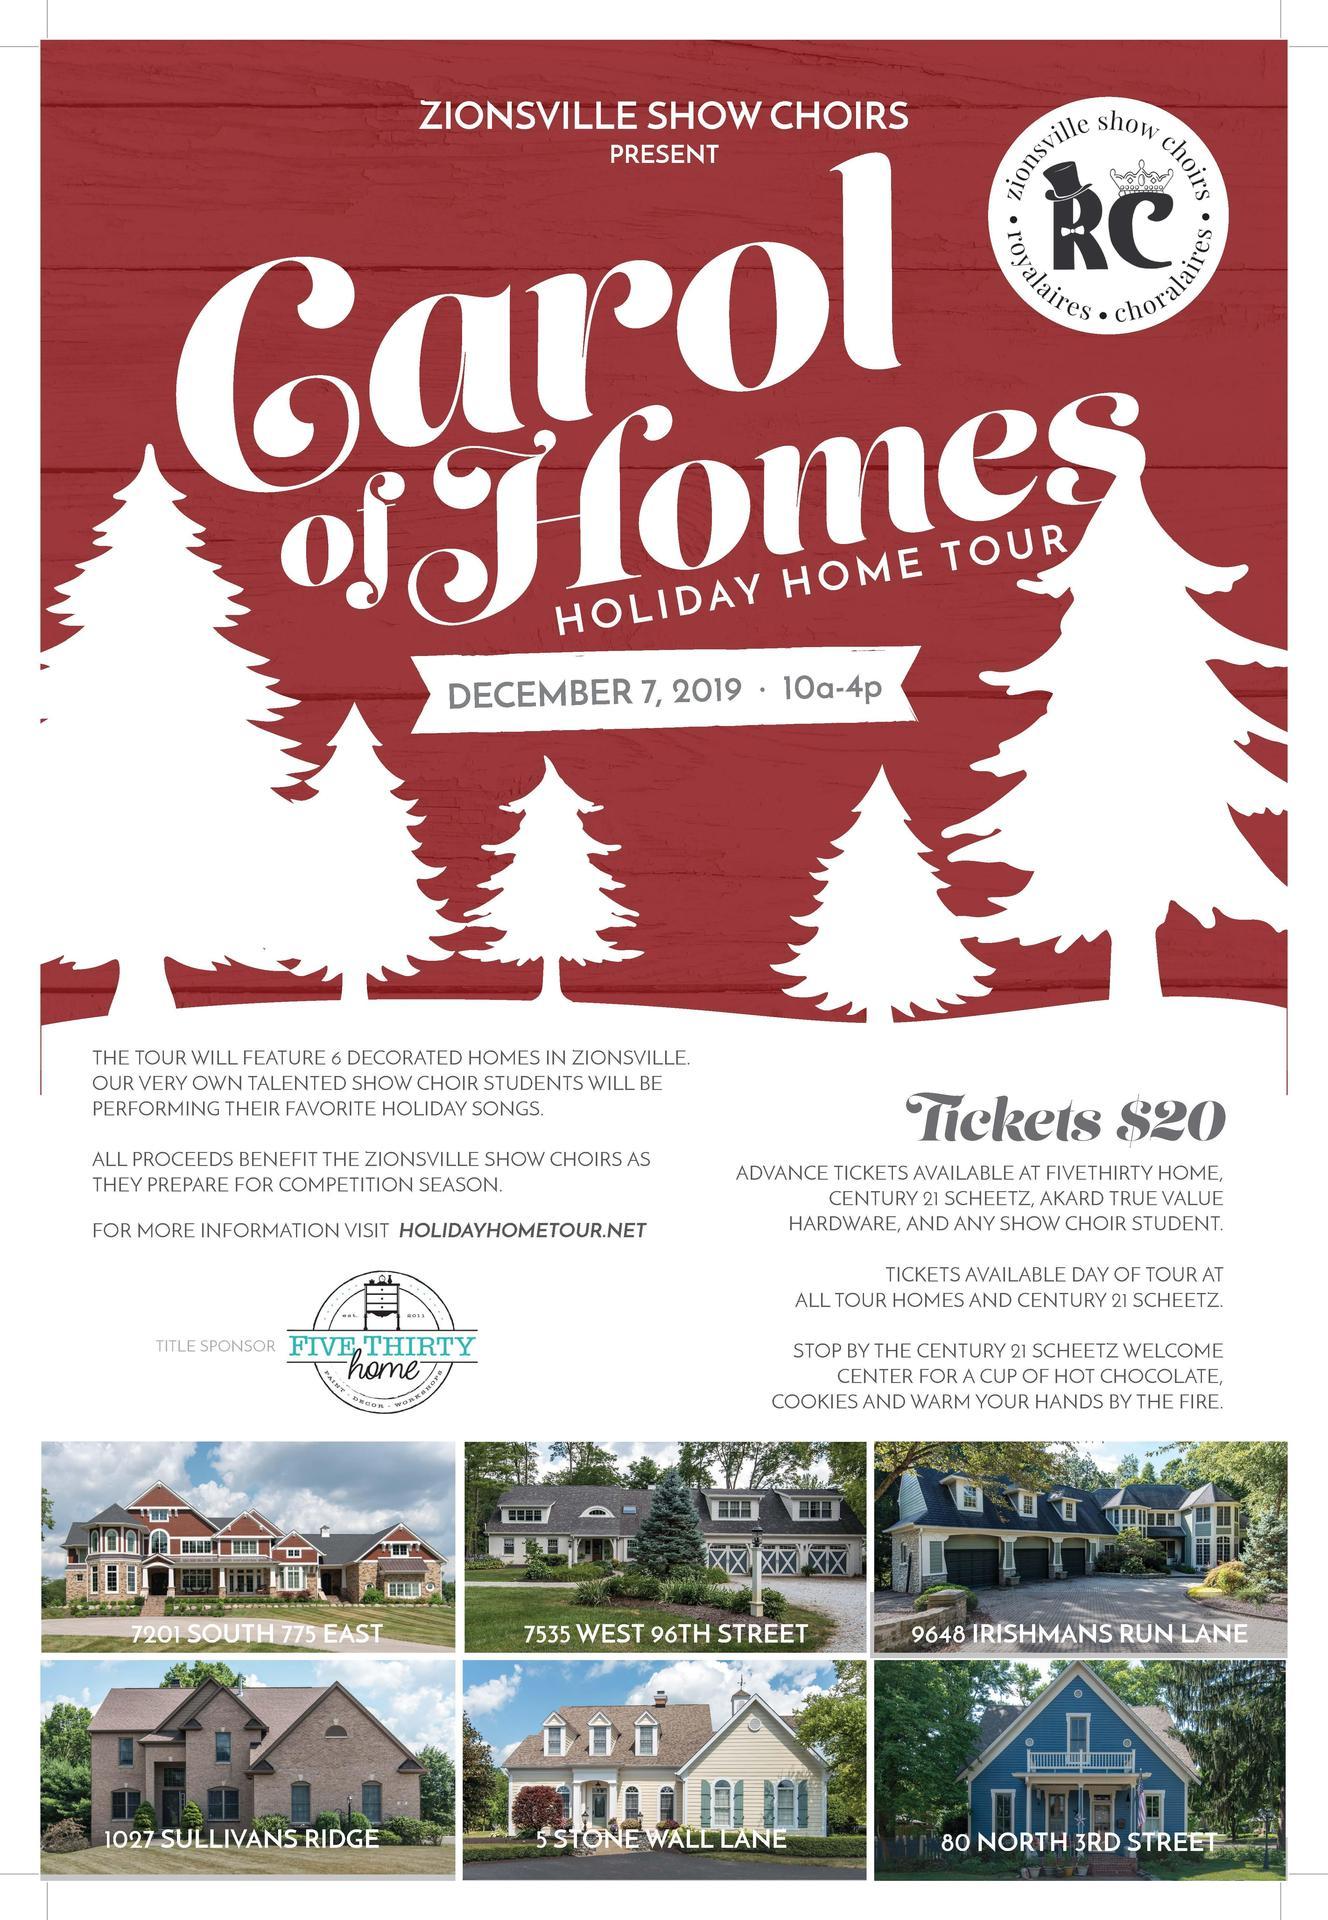 ZCHS Show Choirs Carol of Homes 2019